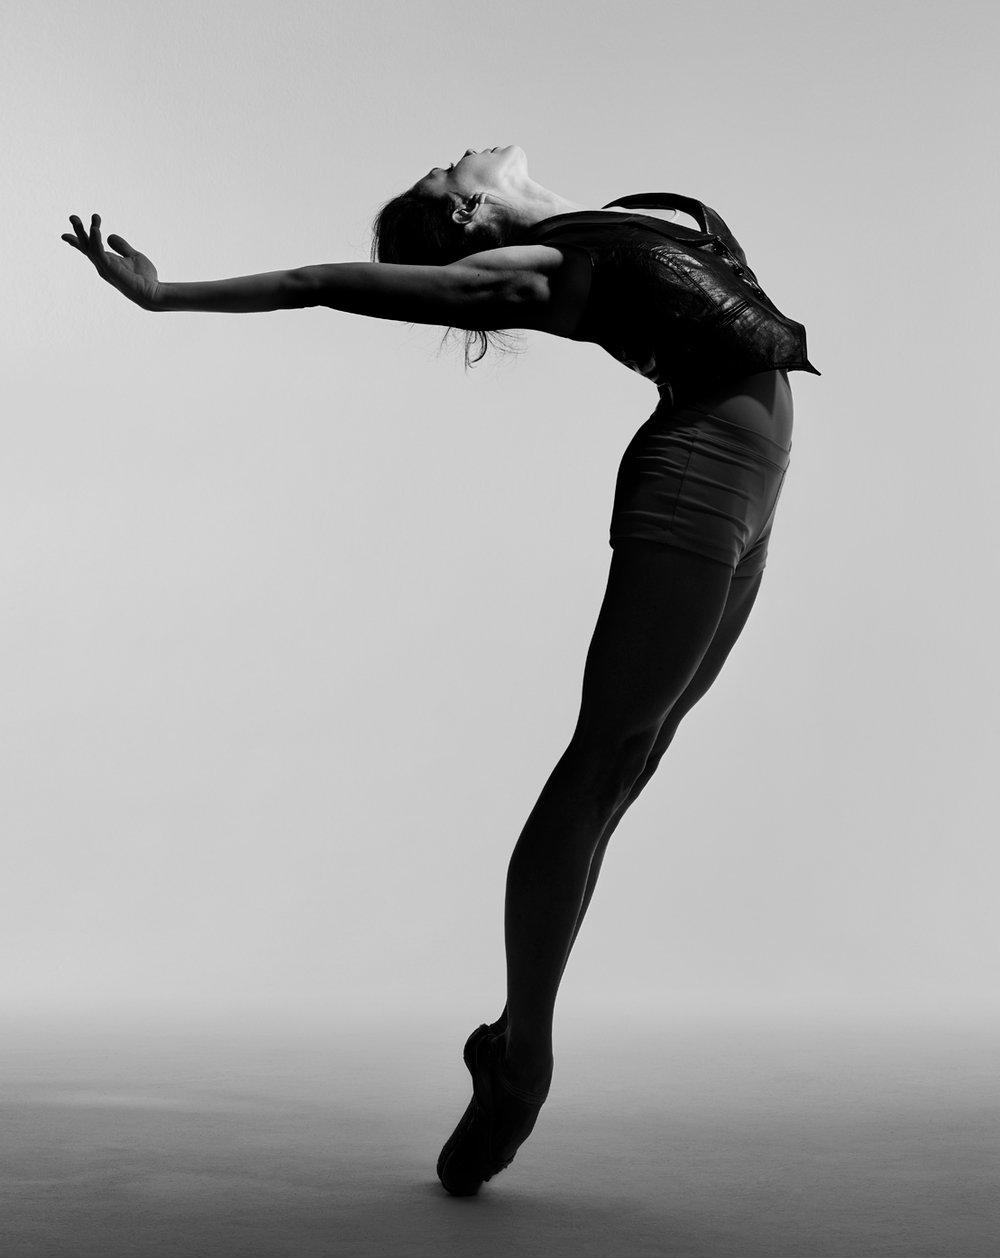 Image of Natalia Osipova